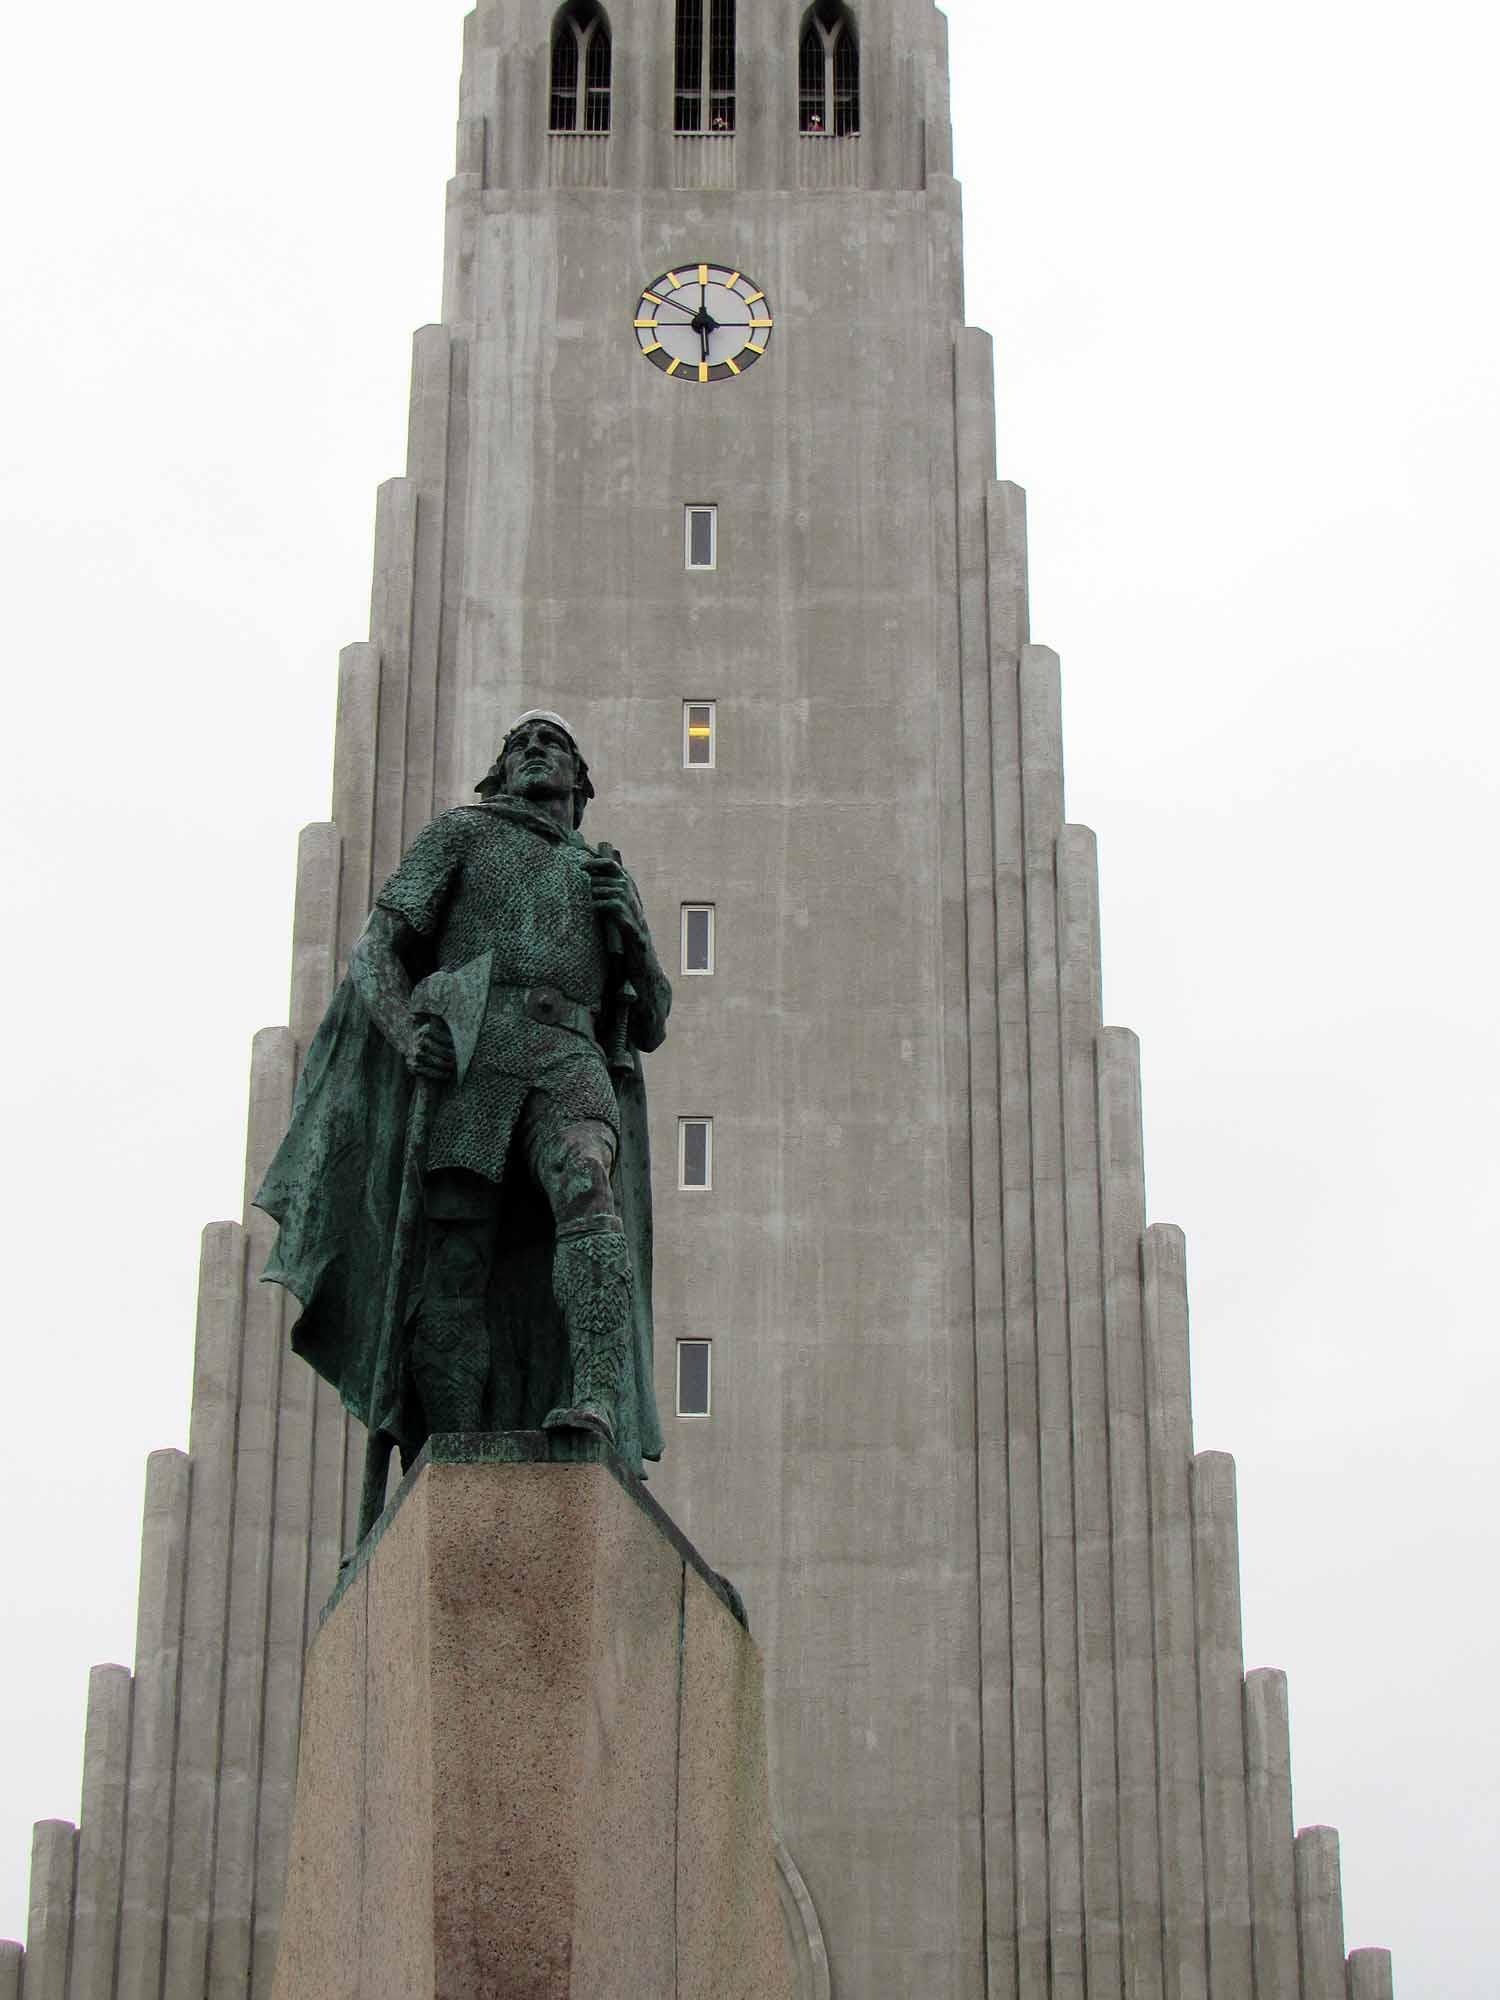 iceland-reykjavík-cathedral-statue.JPG